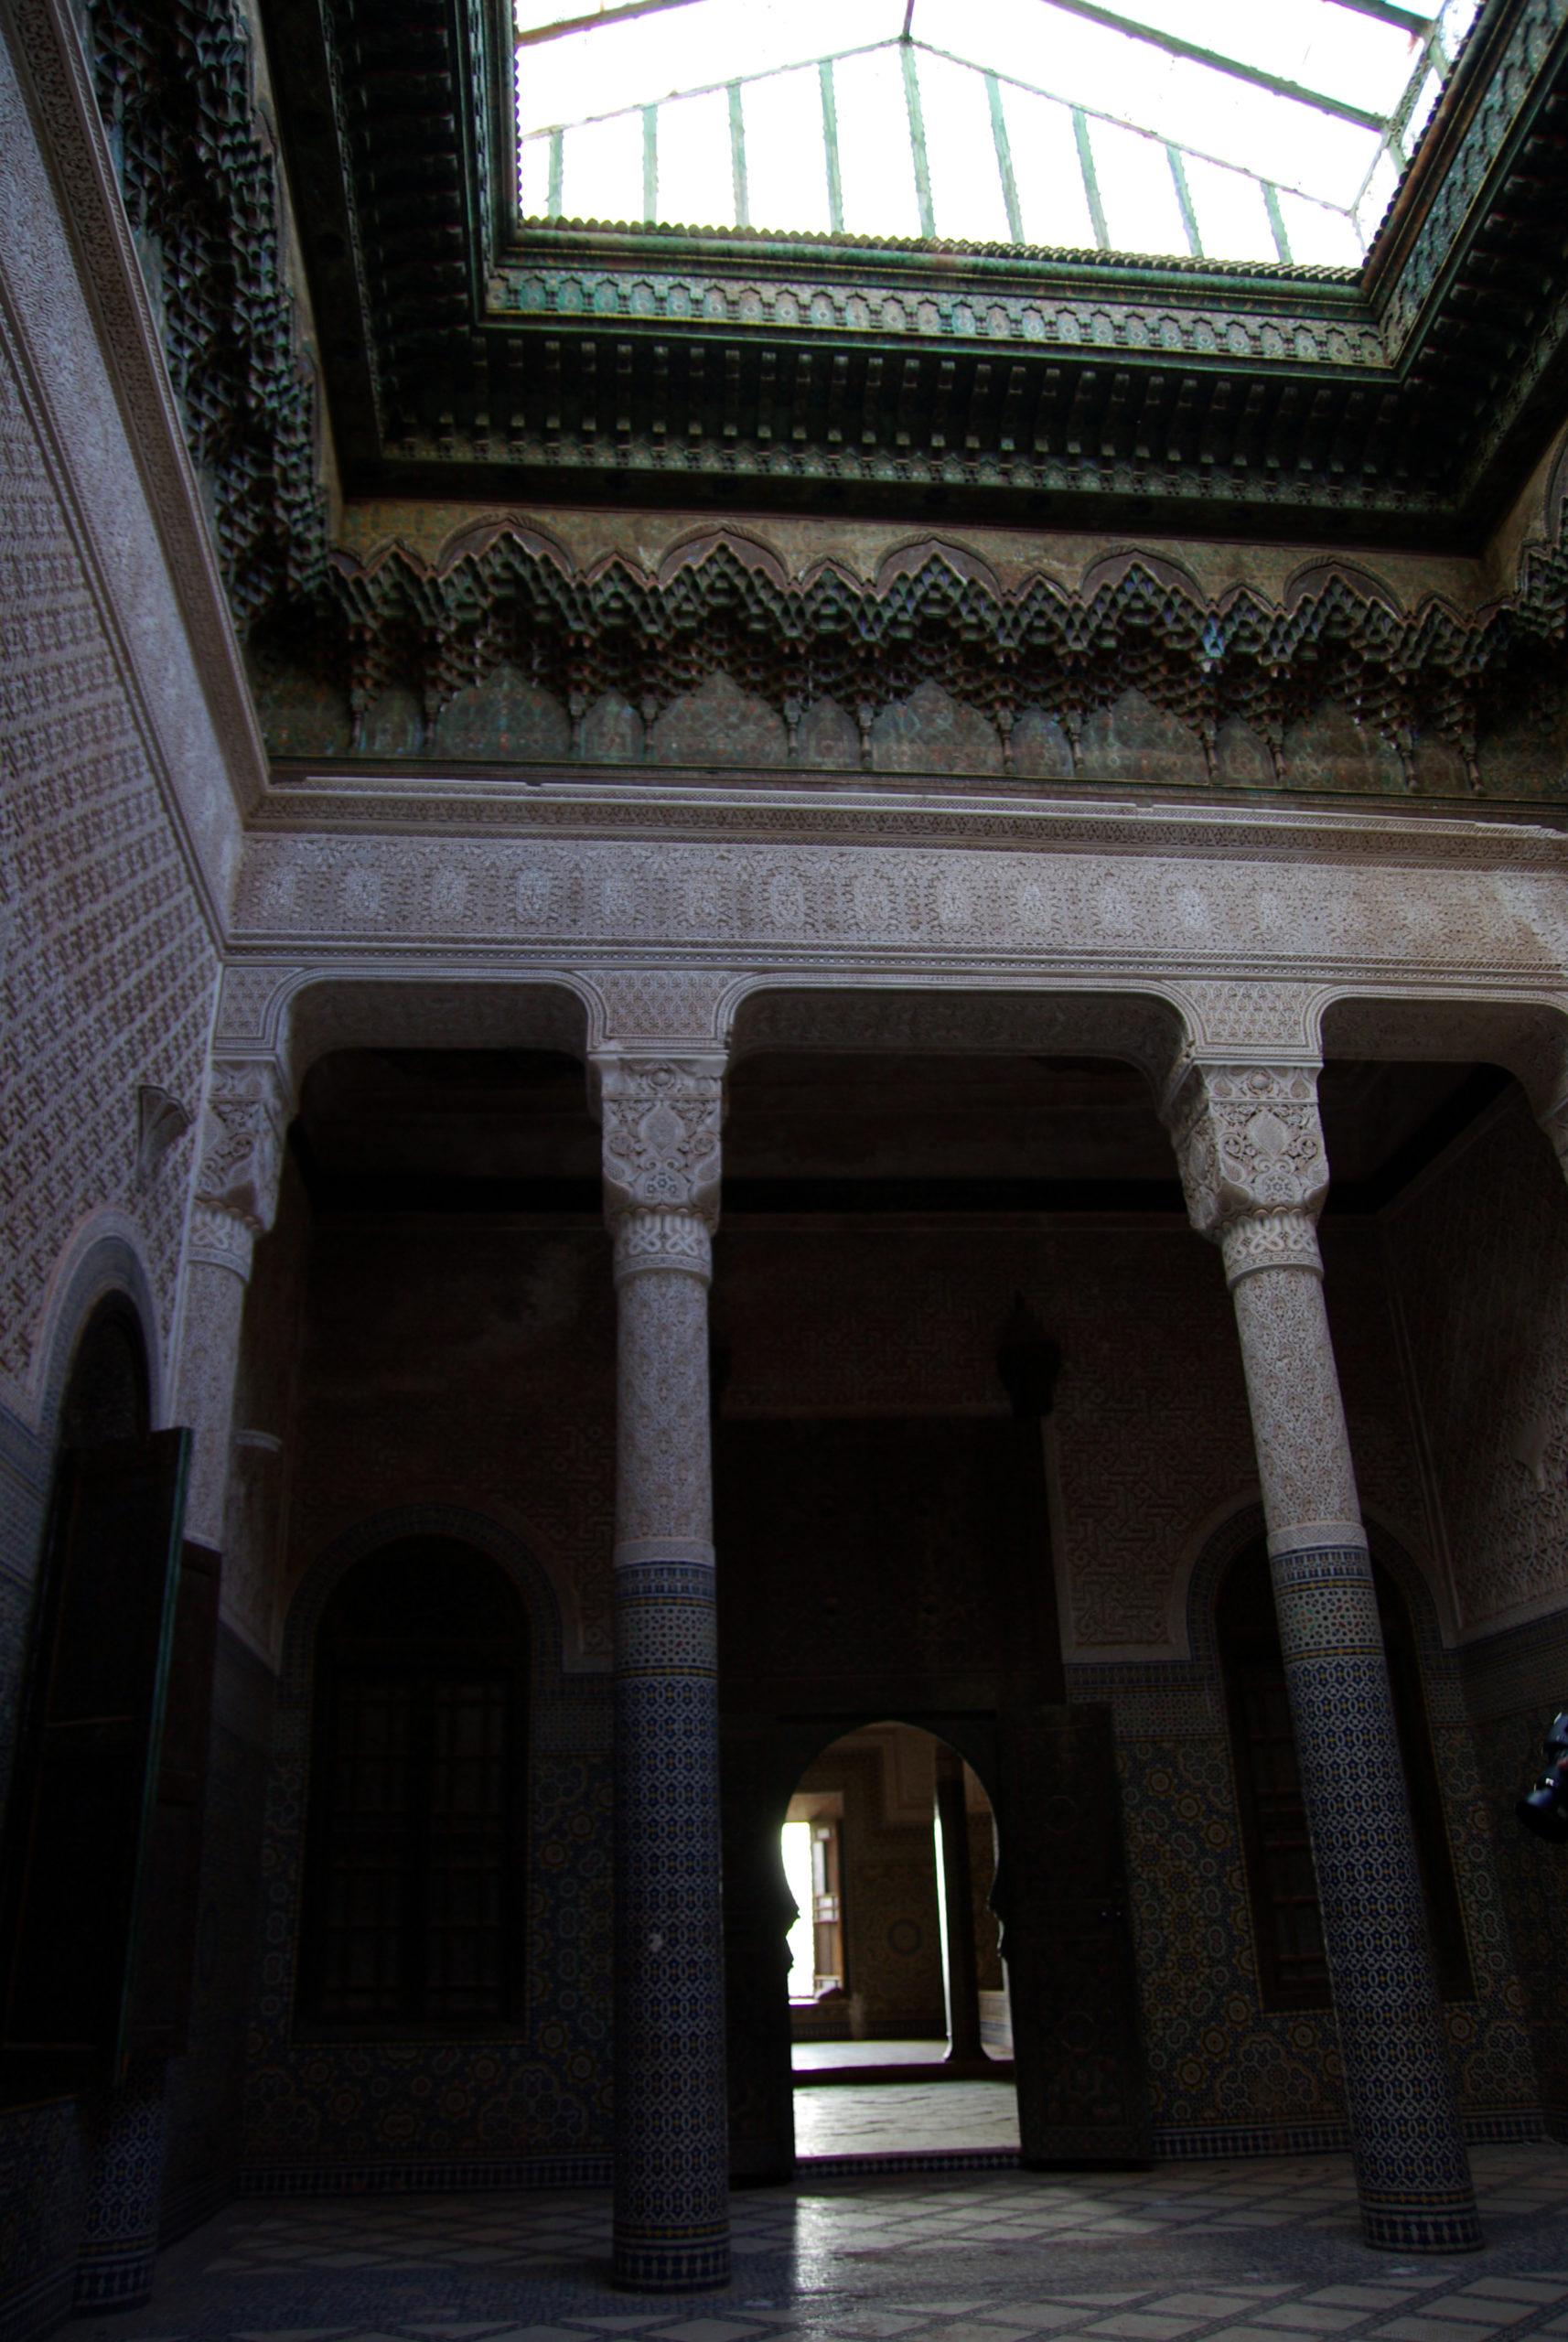 Morocco, 2008